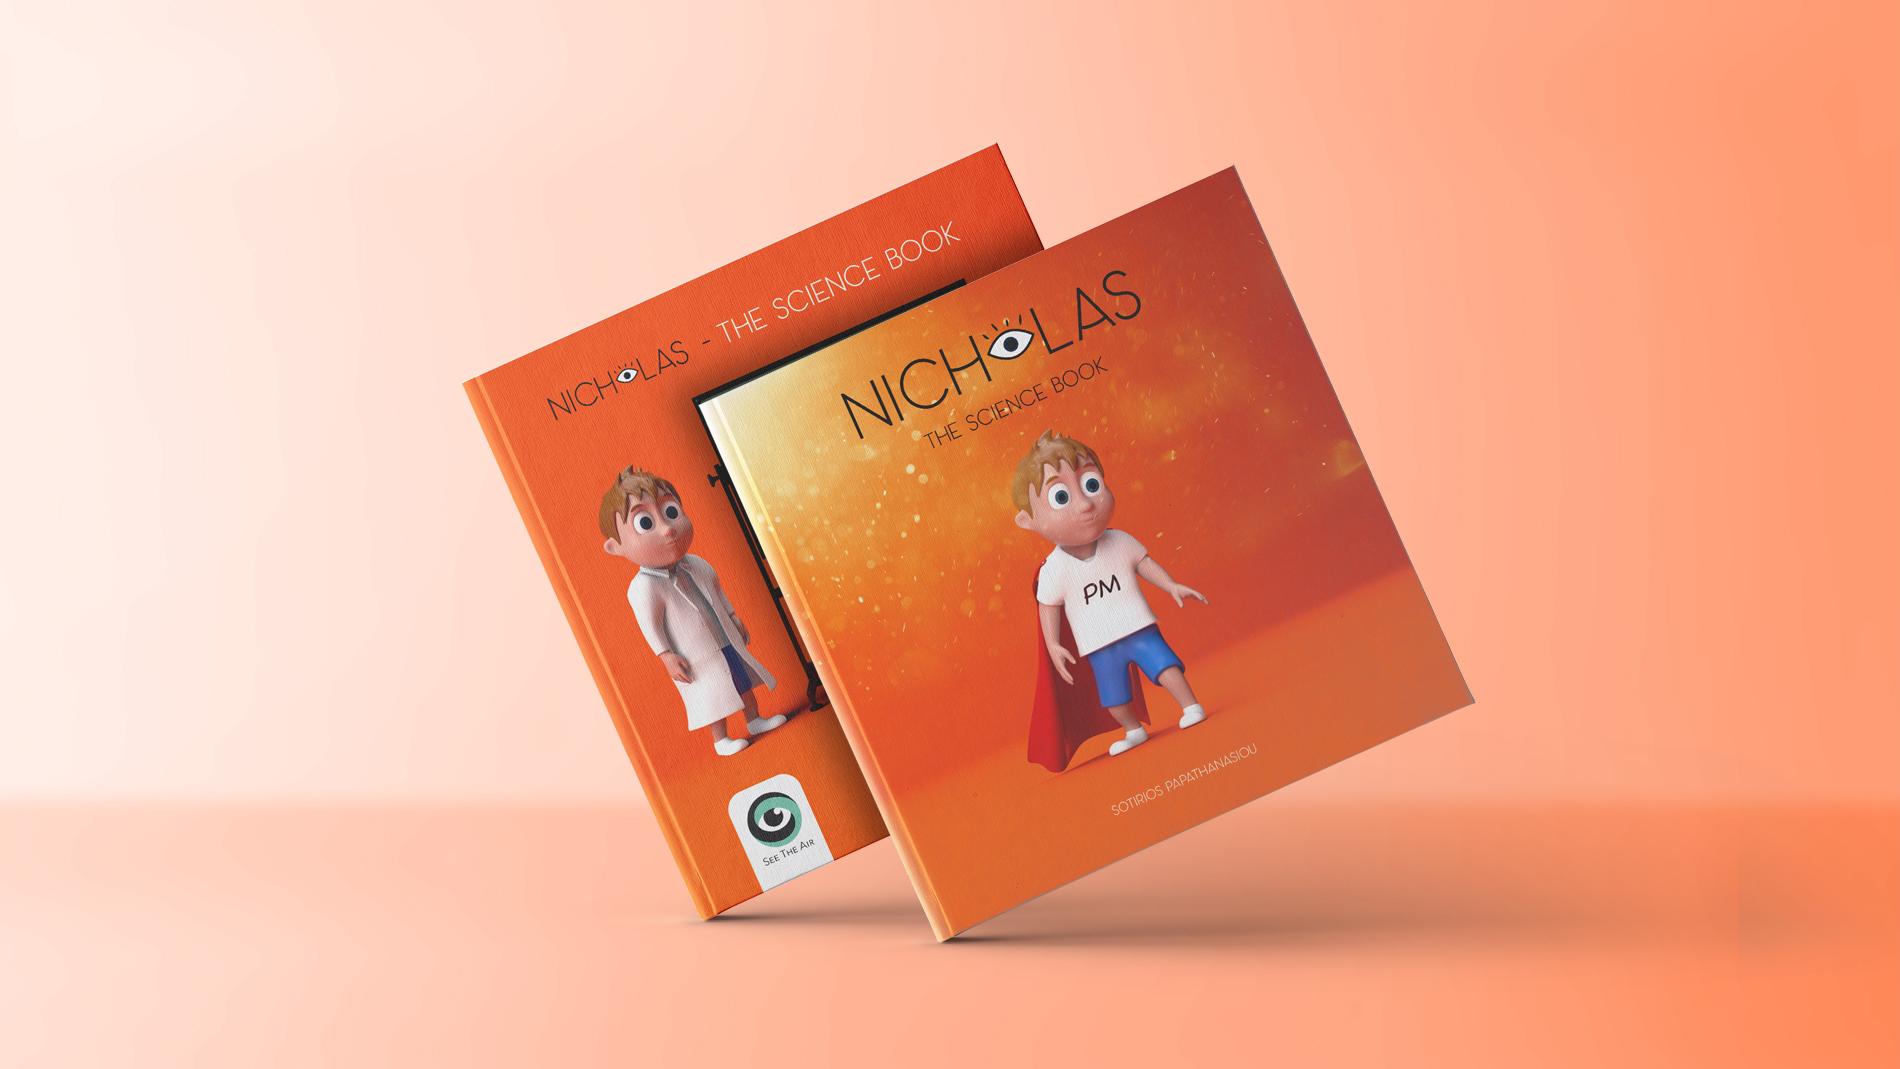 Nicholas – The Science Book